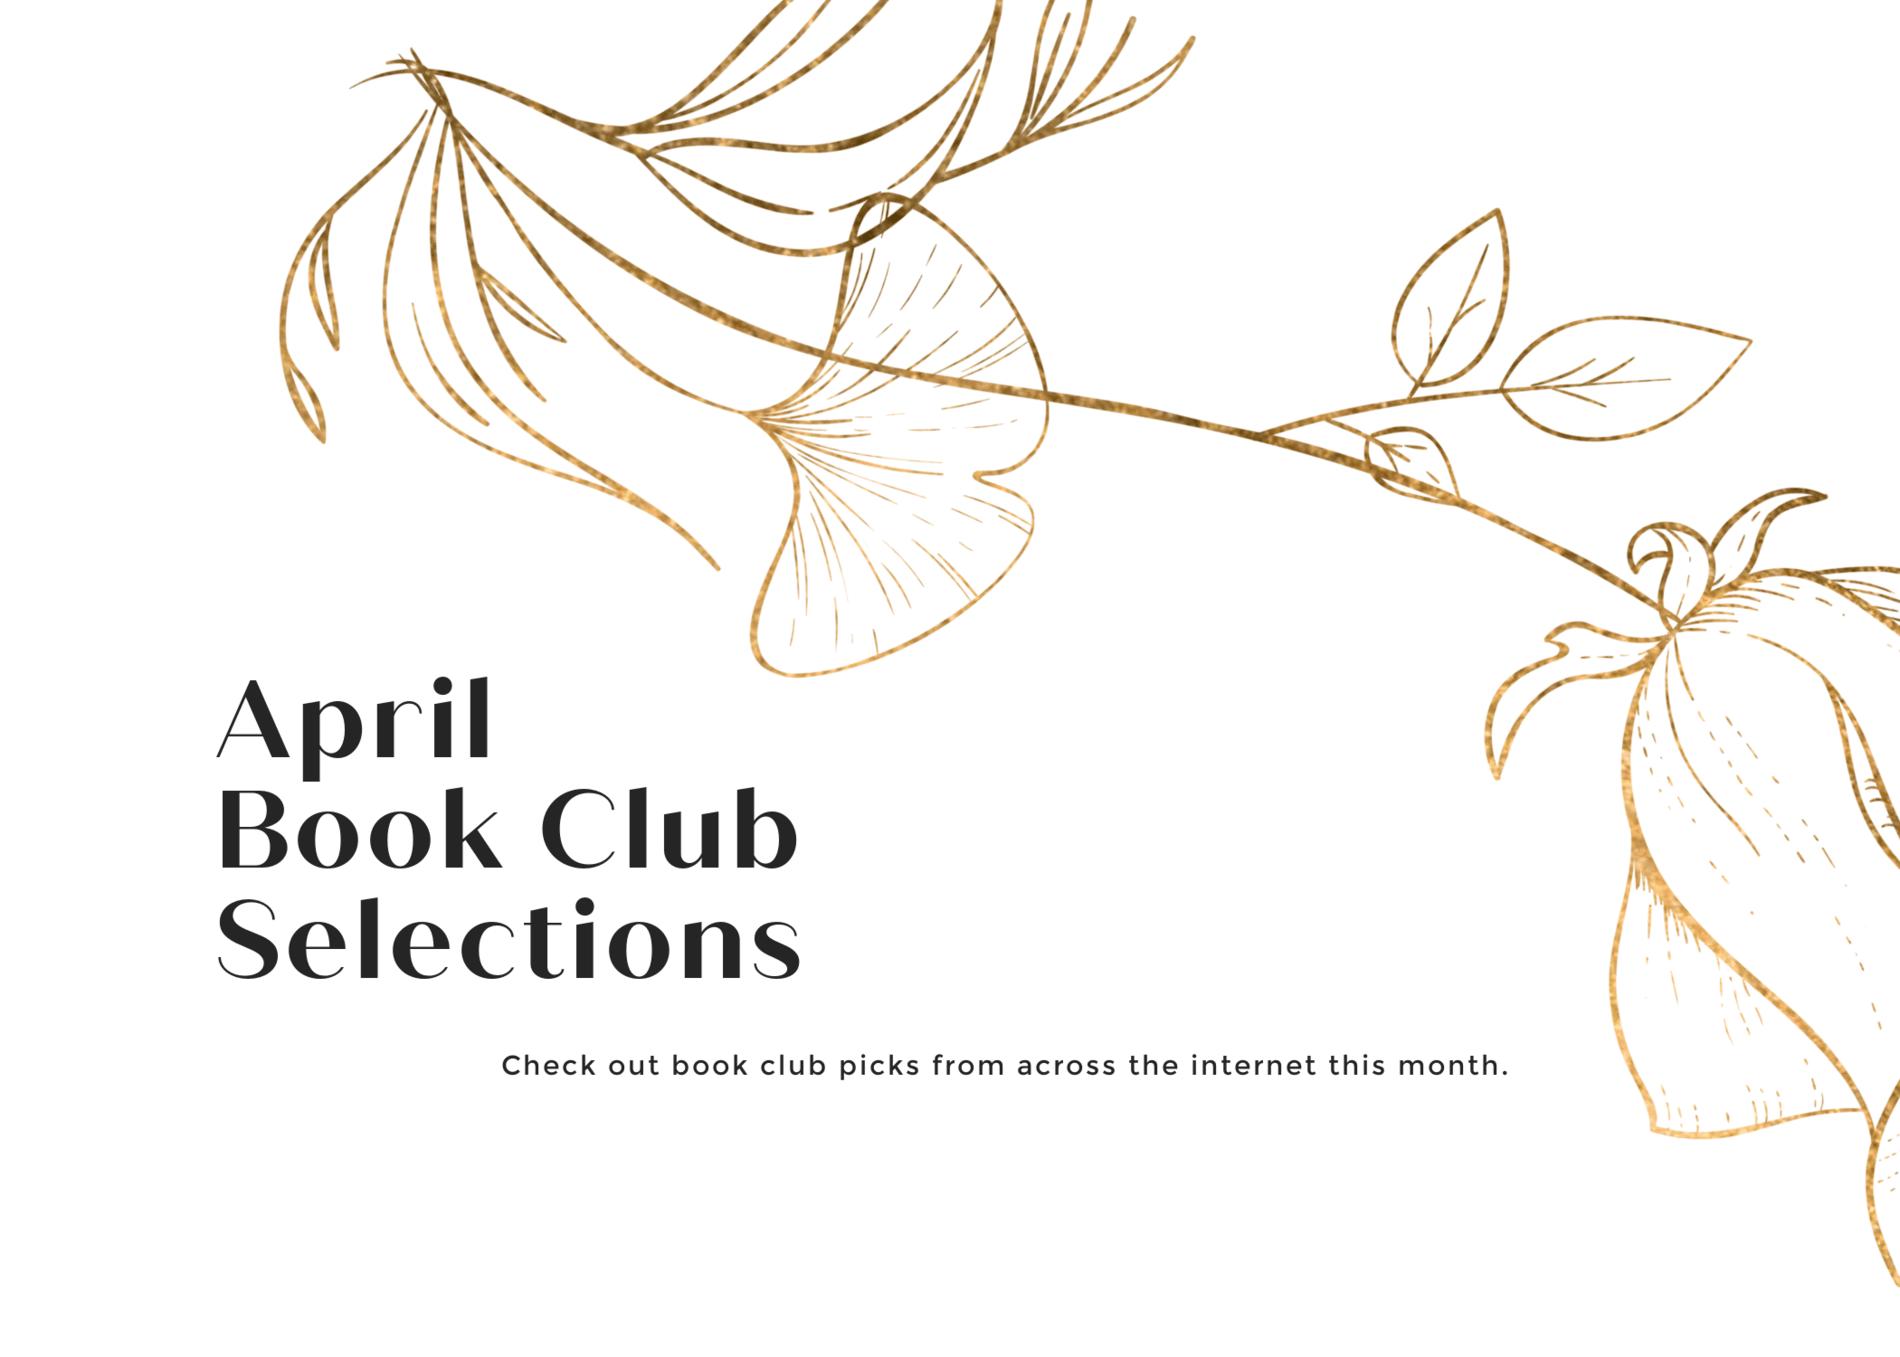 April 2021 Book Club Selections